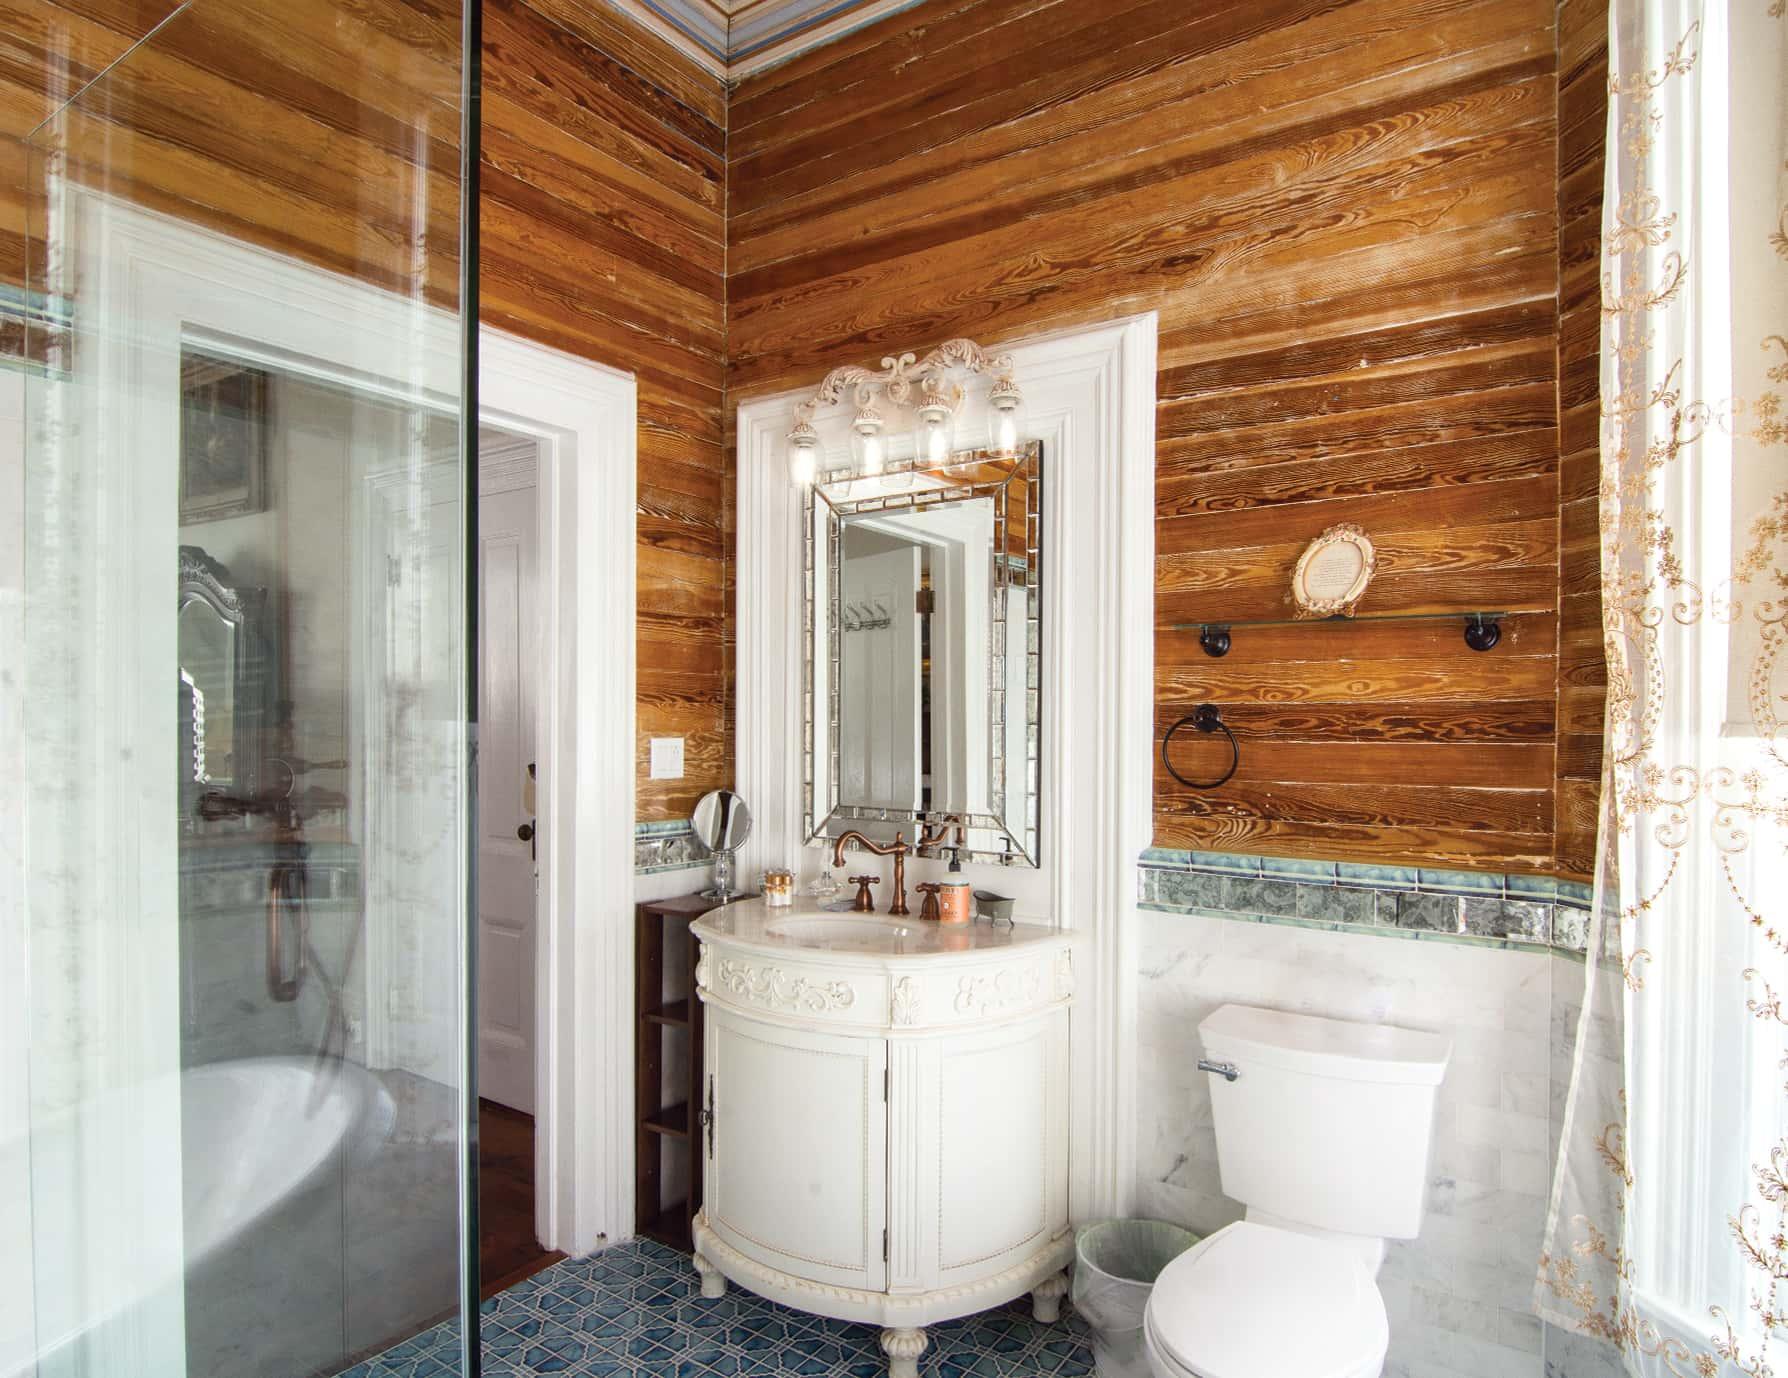 Anne Suite bath sink at our Key West, FL Inn